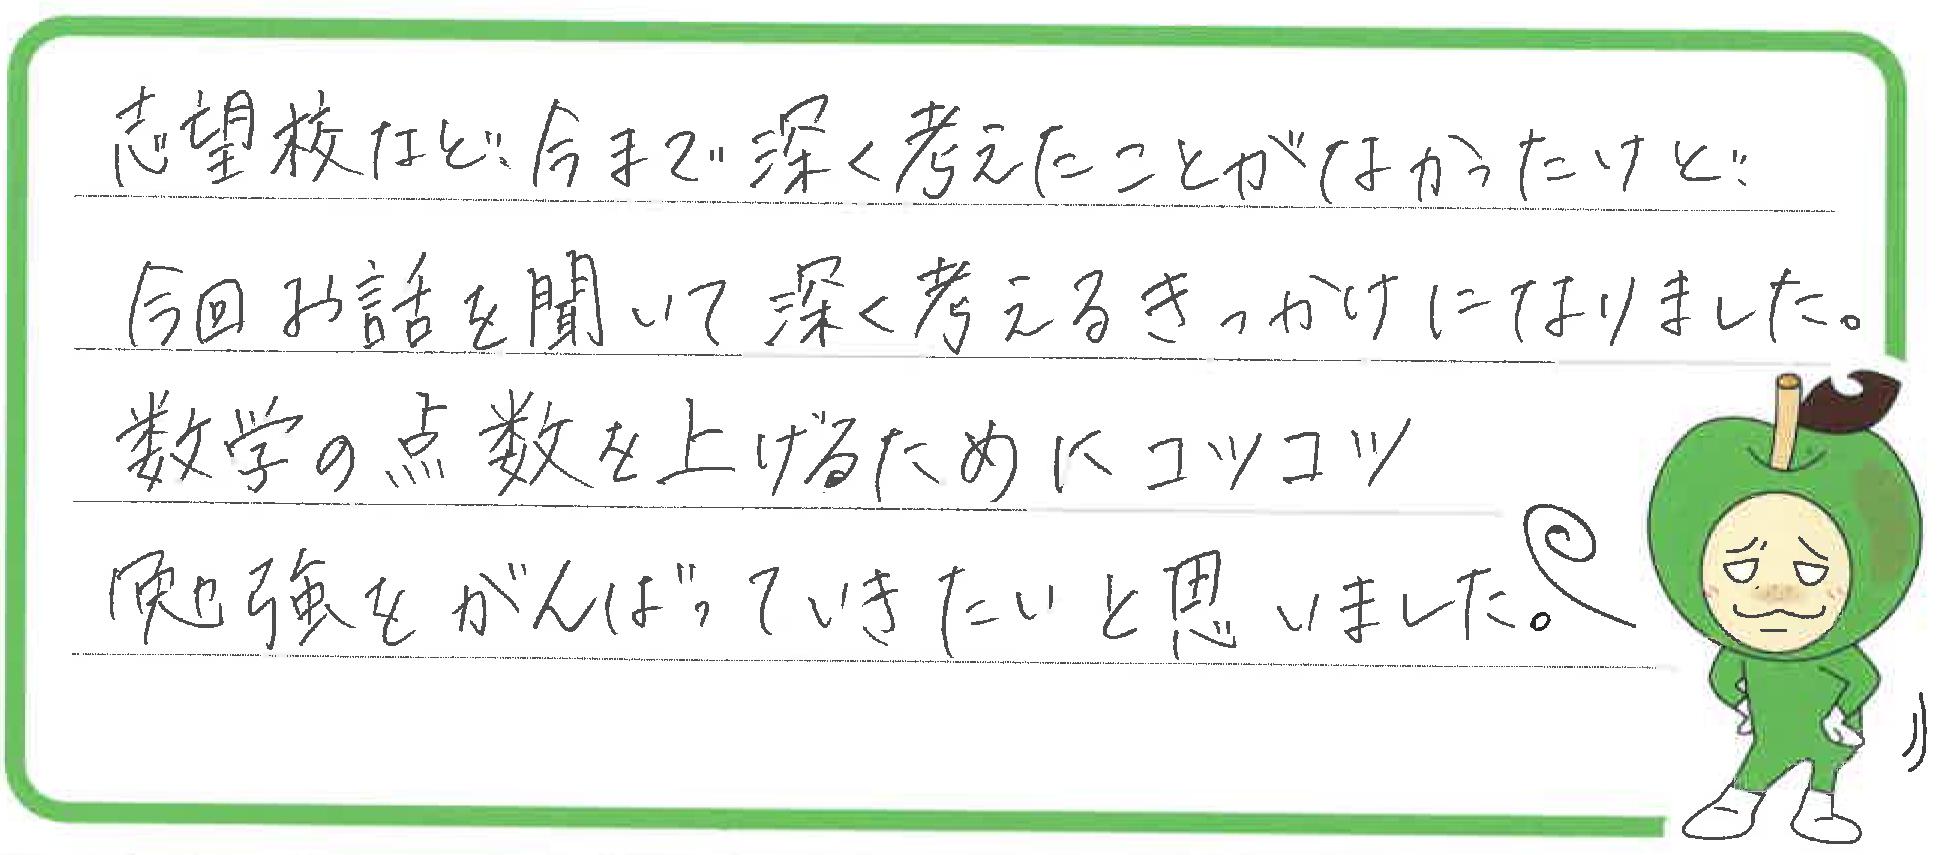 Hちゃん(河北郡津幡町)からの口コミ